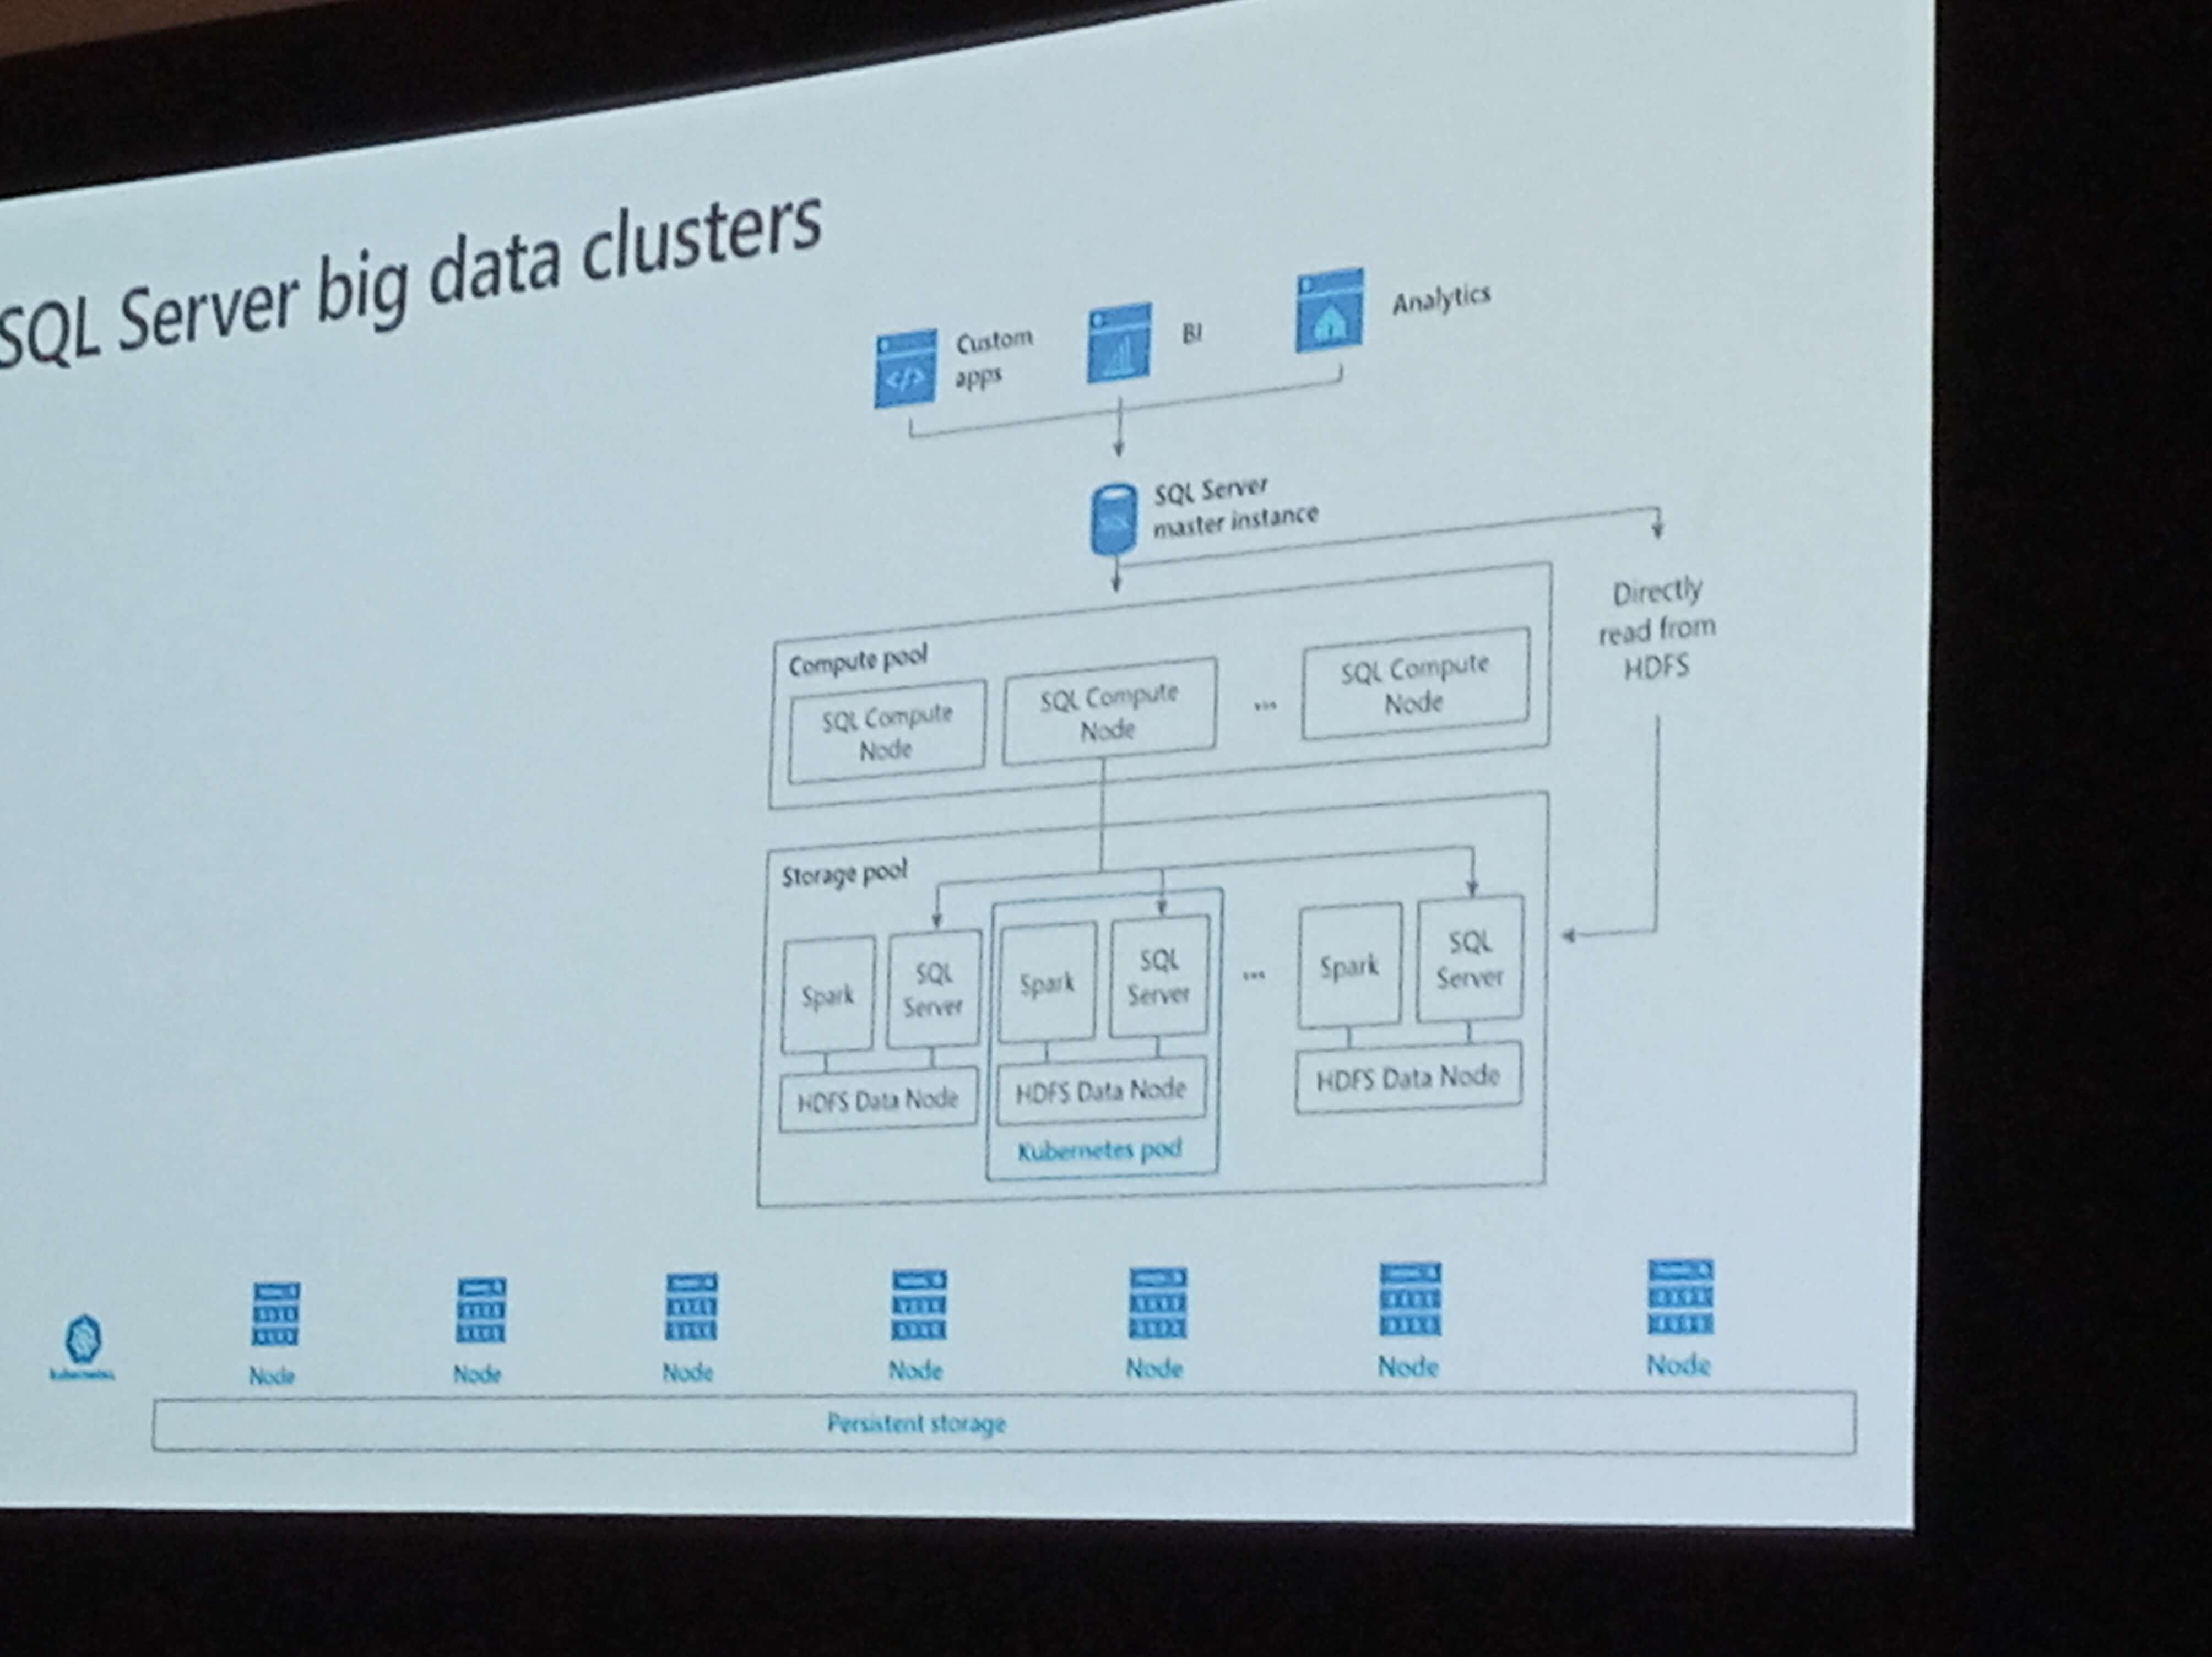 PASS Summit Big Data Cluster